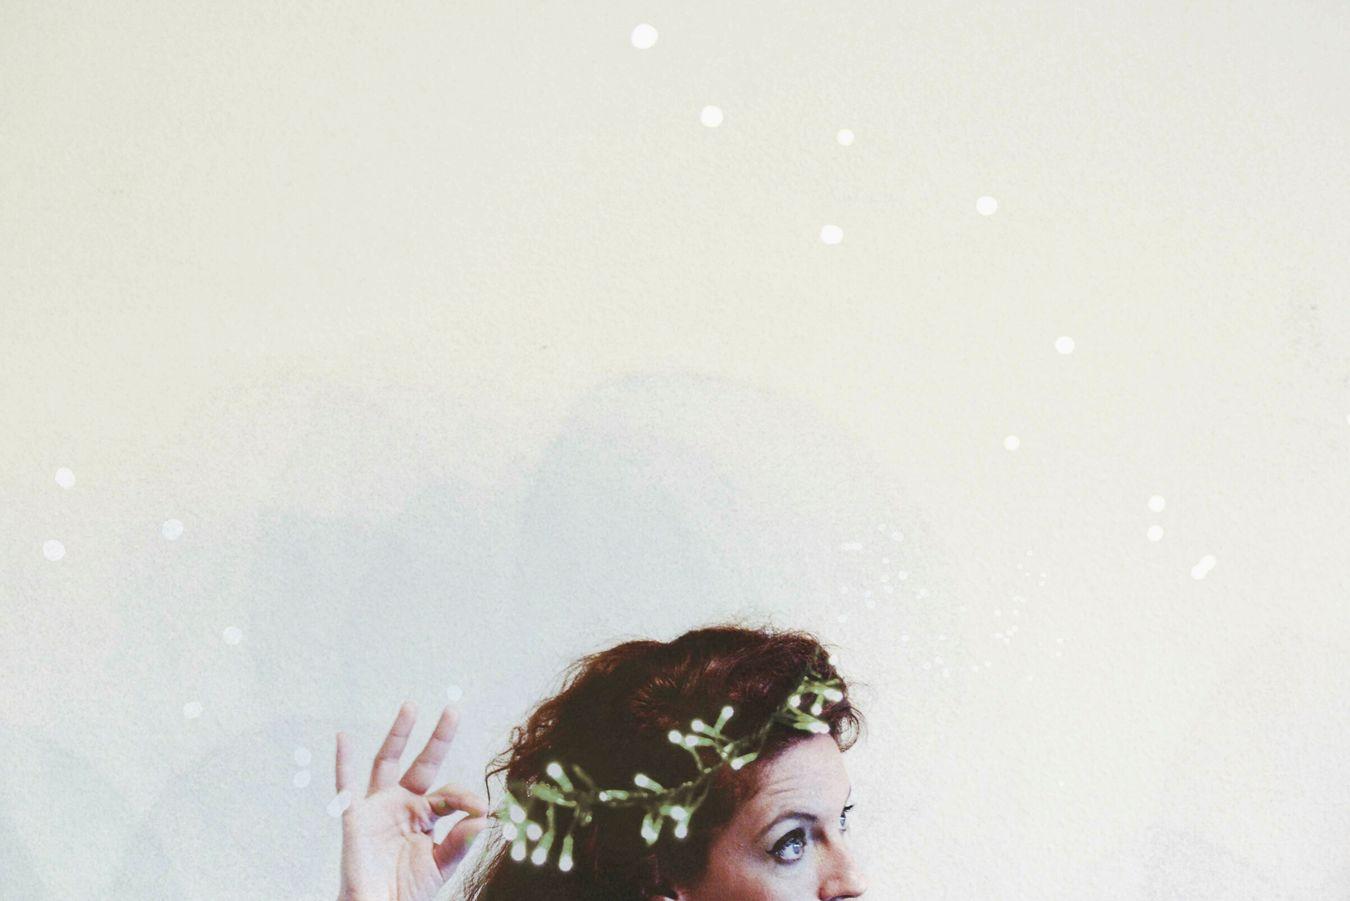 SARA MARTÍNEZ CABELLO Portrait Of A Woman Eyeemphotography EyeEm Best Shots - People + Portrait Model Photoart Modelgirl Sesionfotografica  Artistic Photography Portrait Lachicadelbonet Hair Retratos Actress Portraiture Redhair Portrait Photography Tripleexposure Photographer Portrait Of A Girl Artistic Photography Shooting EyeEm Gallery EyeEm Best Shots Portrait Of A Friend